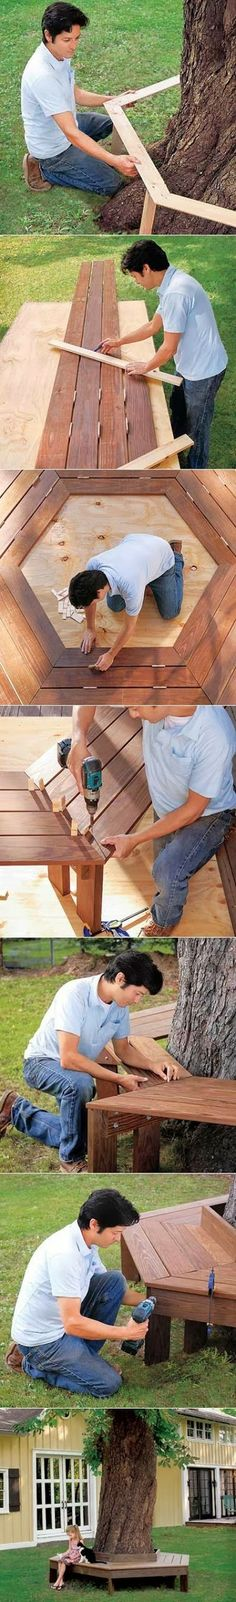 Diy : How to build a bench around a tree | DIY & Crafts Tutorials